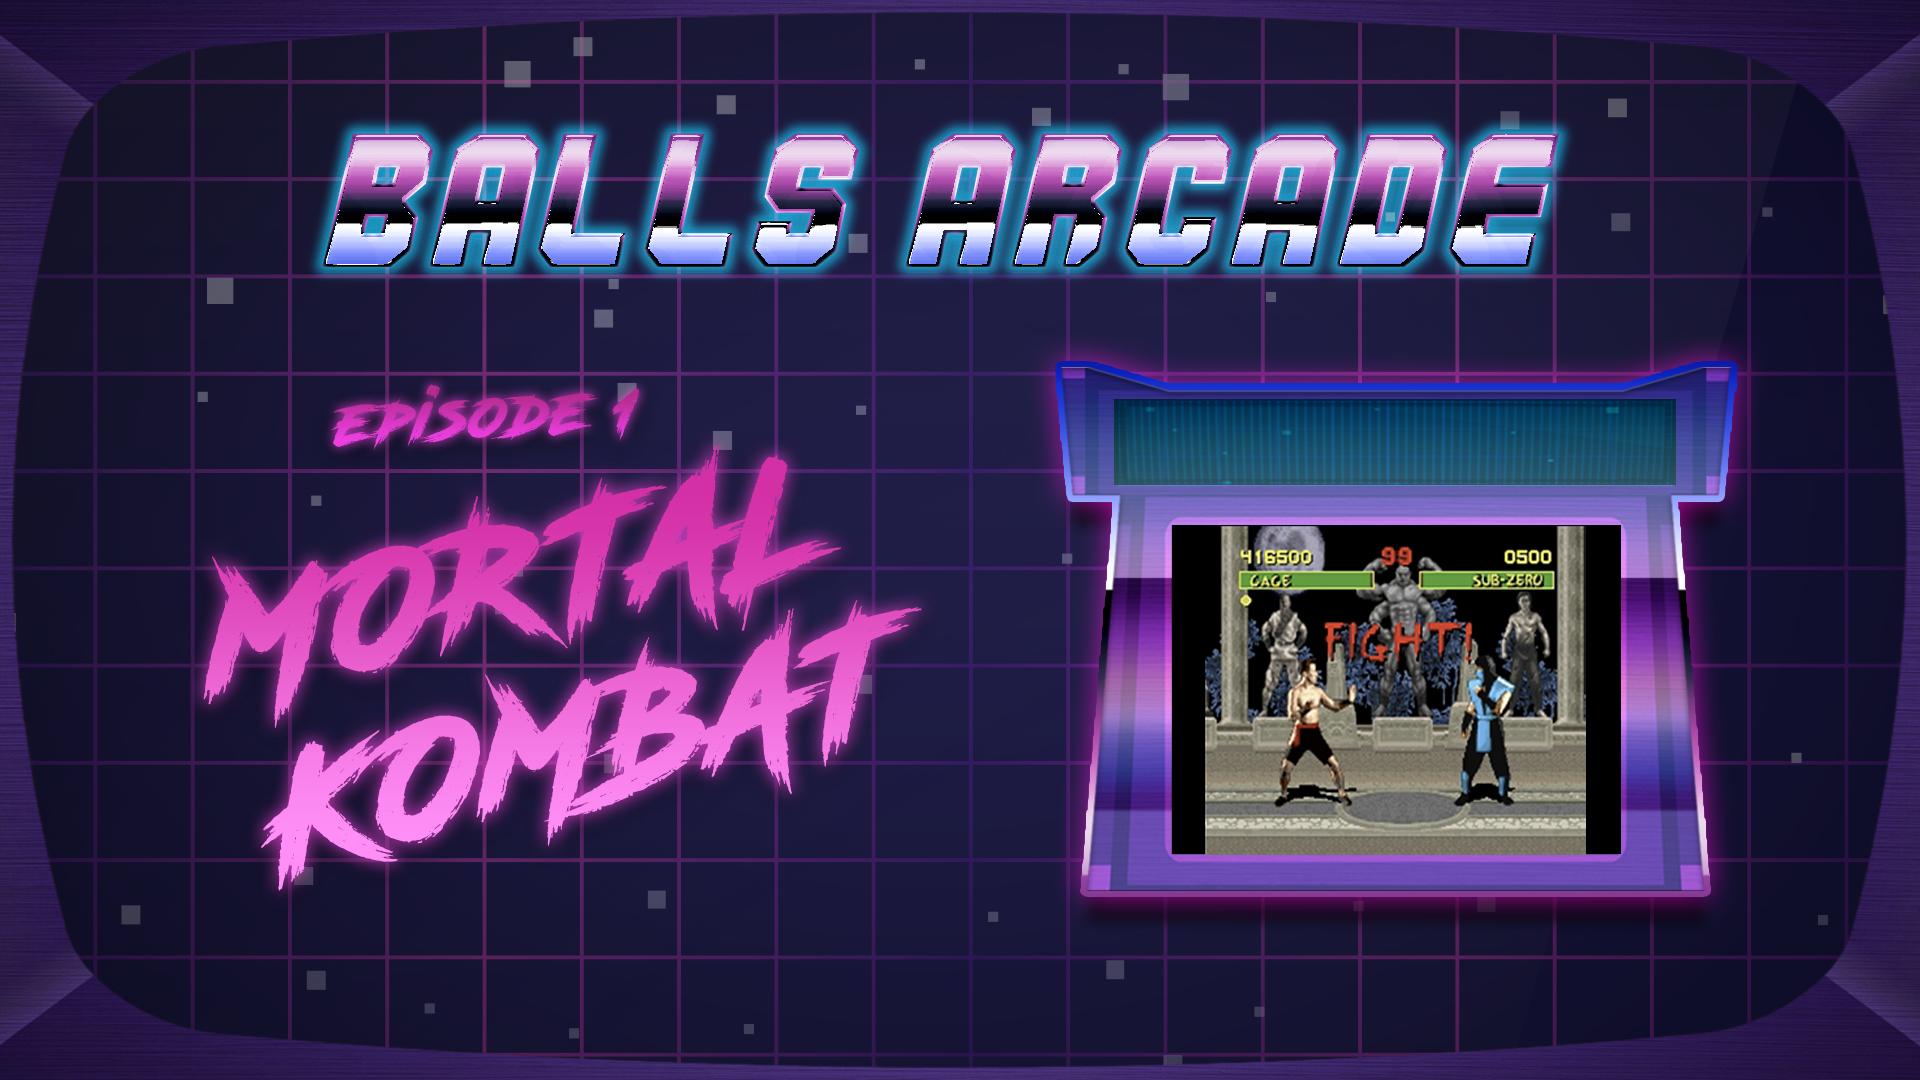 Balls Arcade